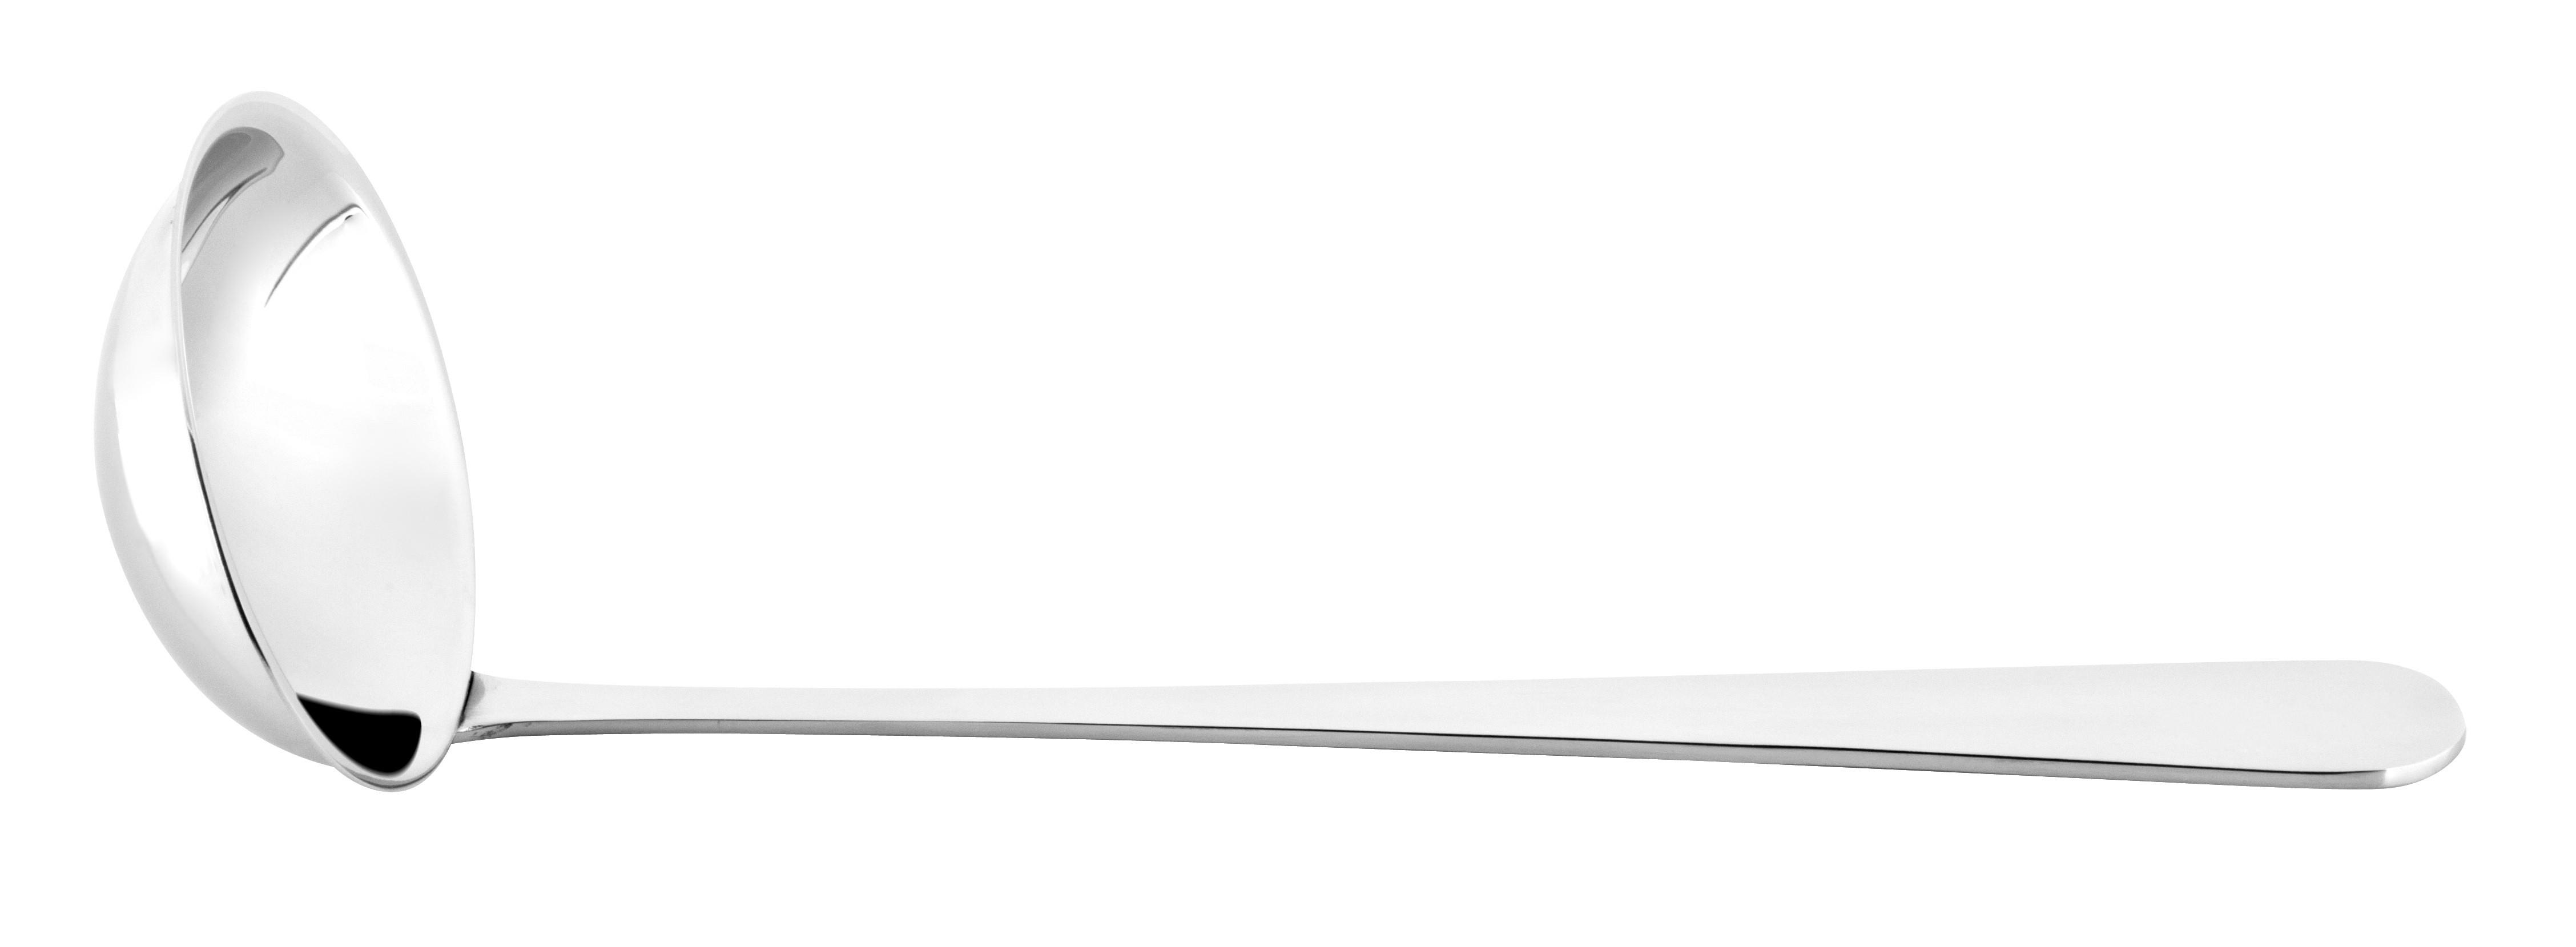 ASUS Schöpflöffel 29 cm